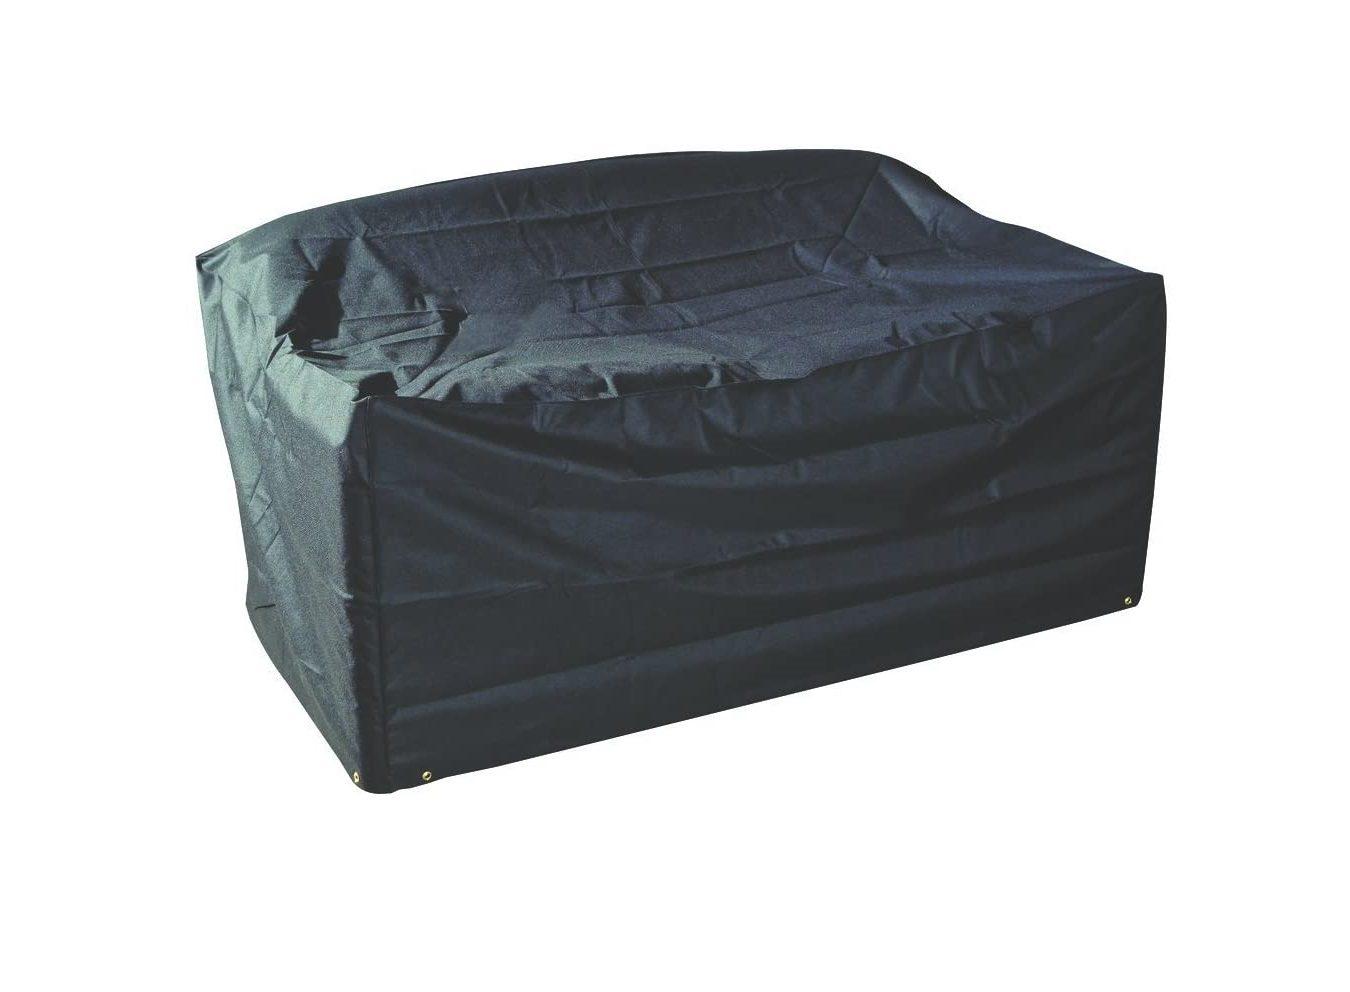 Bosmere Sofa Cover